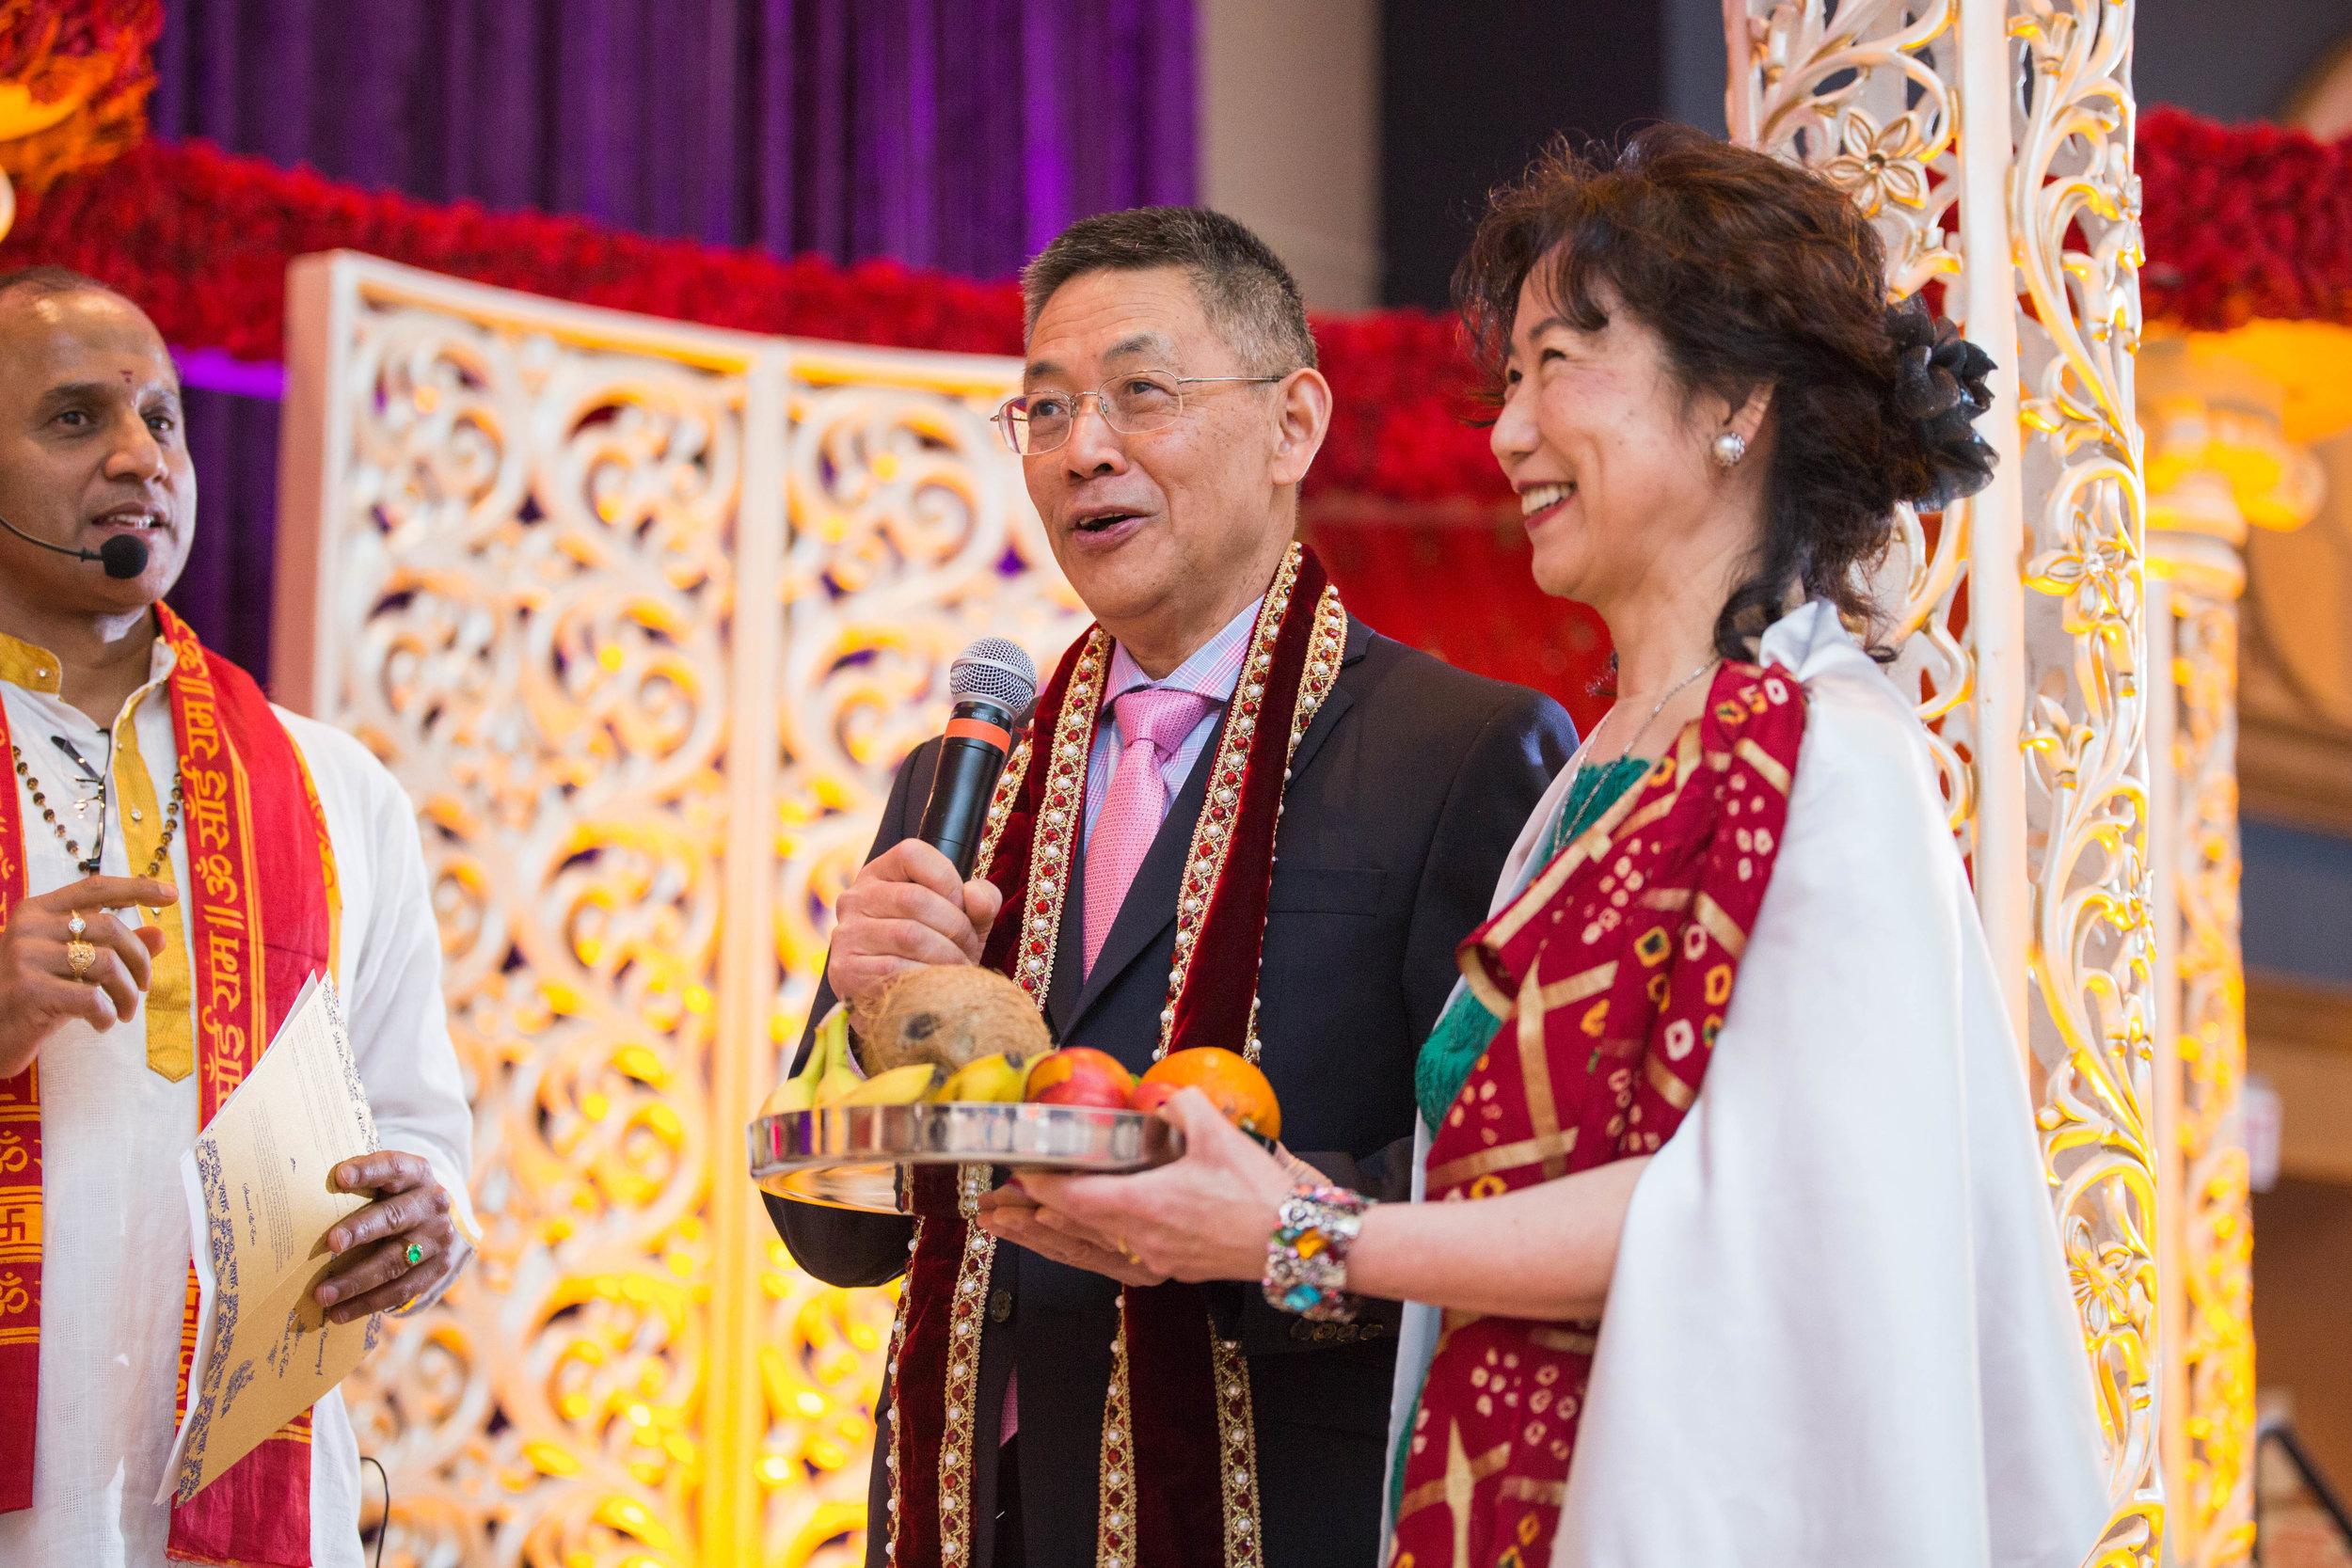 LeCapeWeddings - Chicago South Asian Wedding -74.jpg